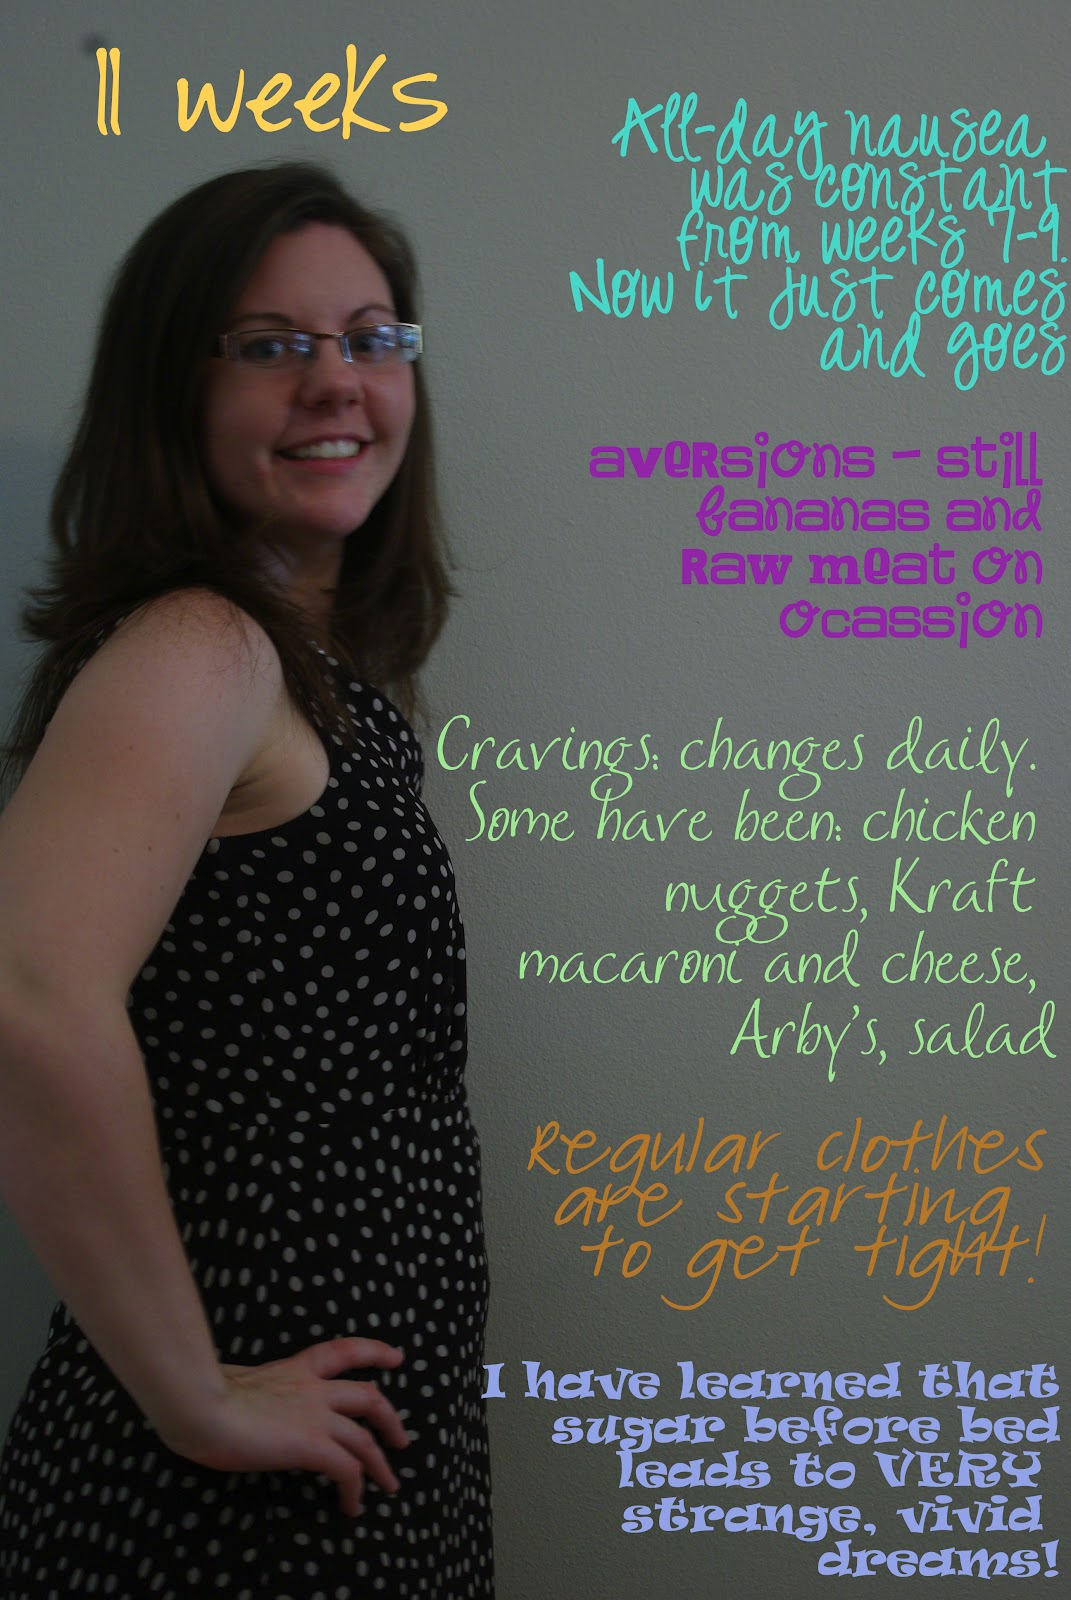 Baby Bump At 11 Weeks Related Keywords & Suggestions - Baby Bump At